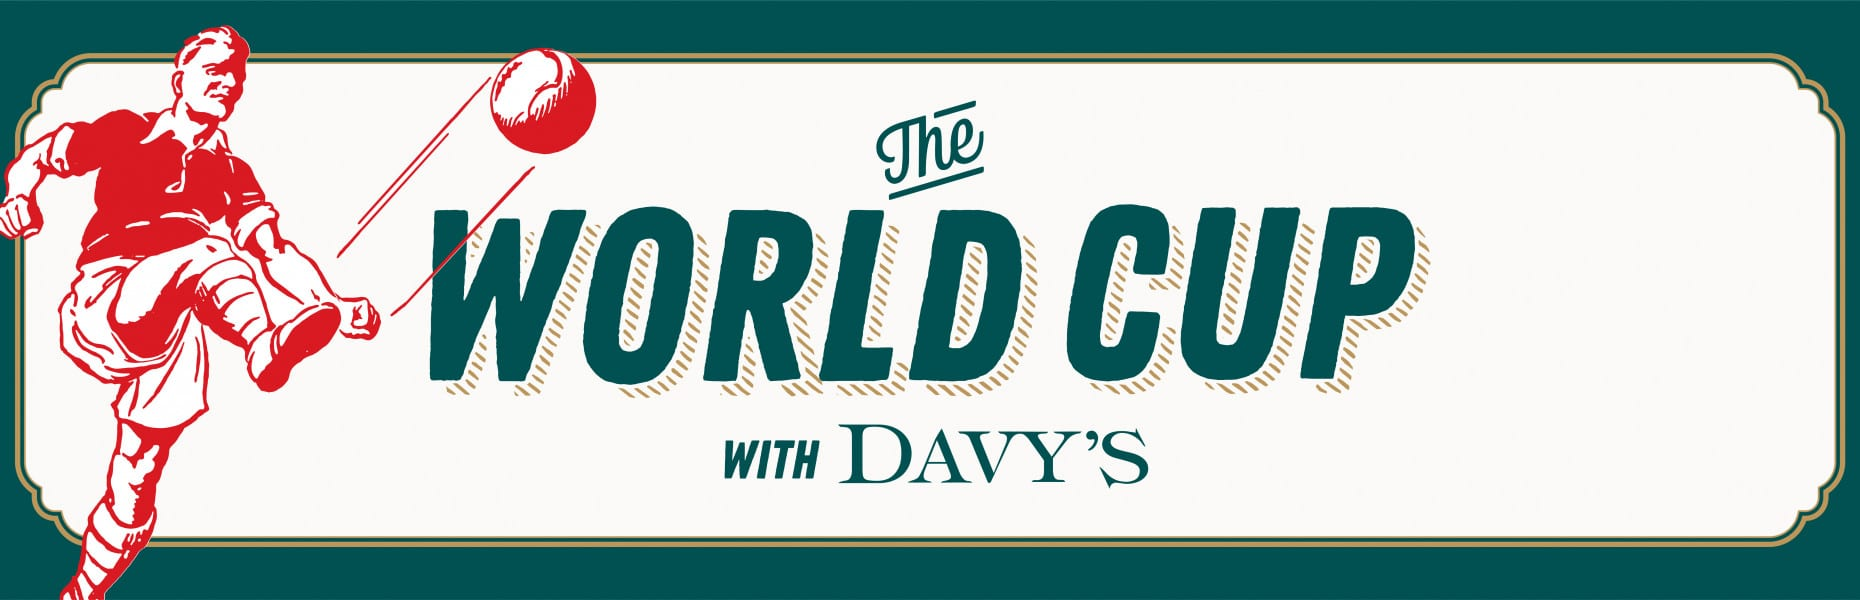 davys-world-cup-1966x600_300dpi